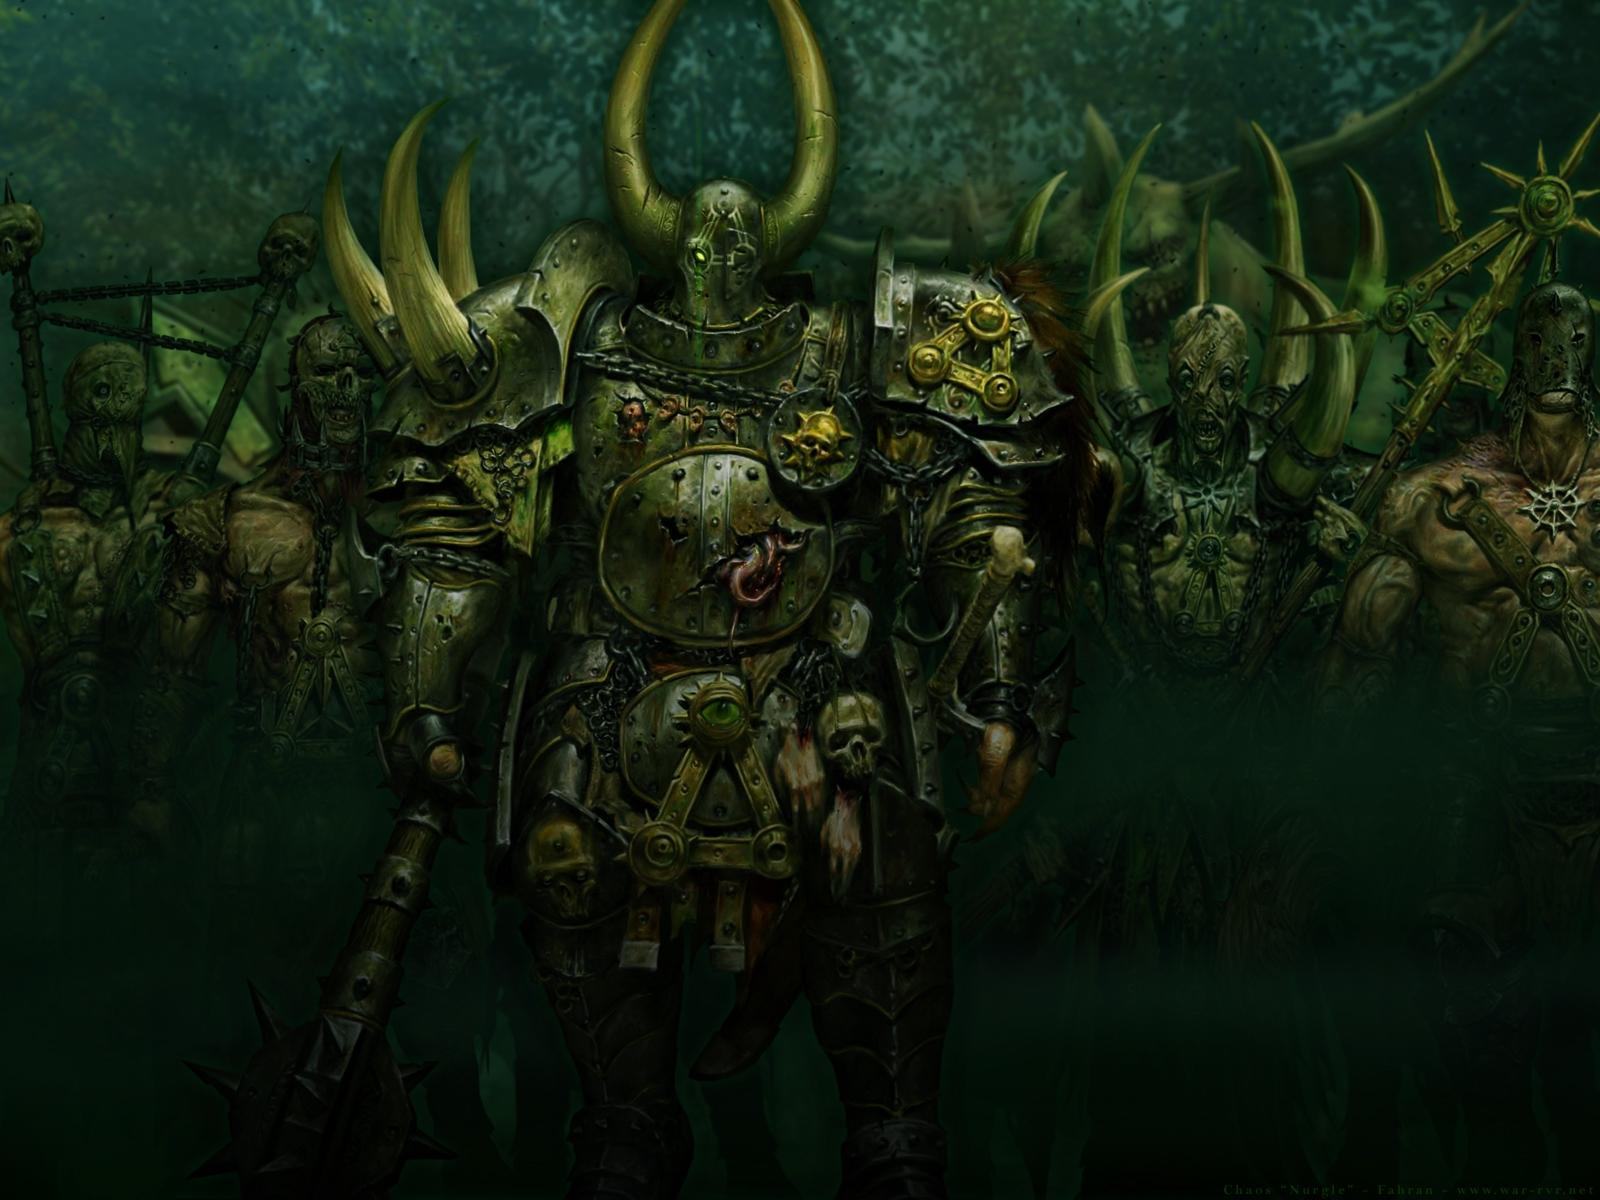 Warhammer Online Chaos Nurgle Wallpaper By David Mills On Deviantart